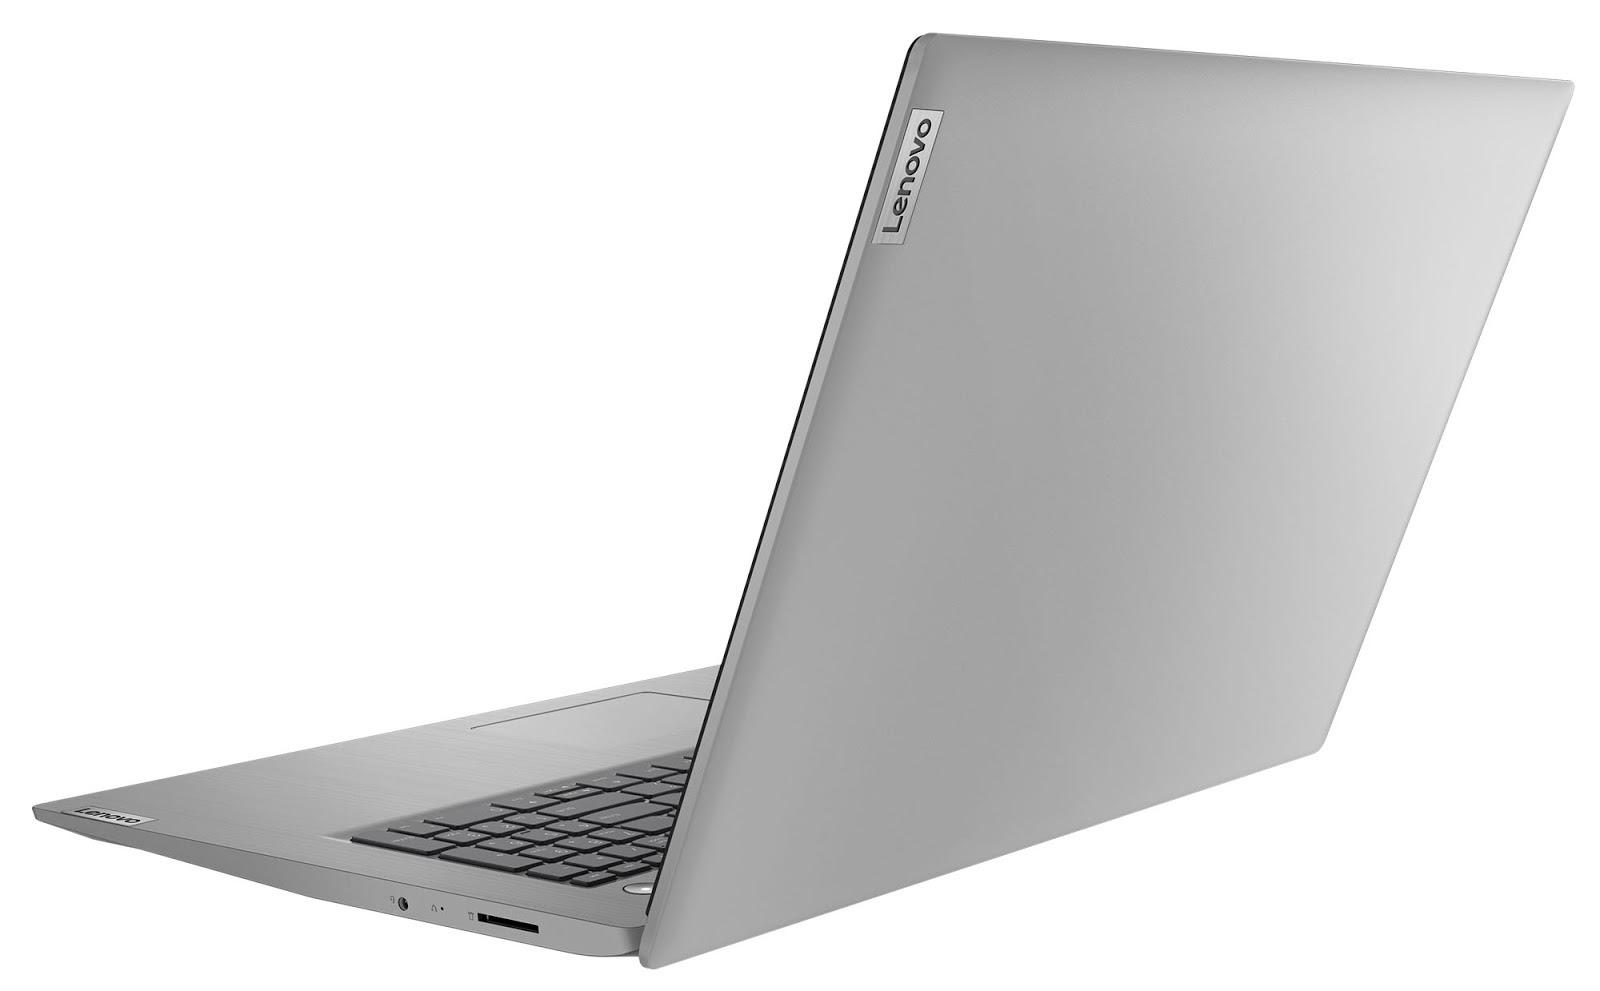 Фото 1. Ноутбук Lenovo ideapad 3 17IML05 Platinum Grey (81WC009VRE)